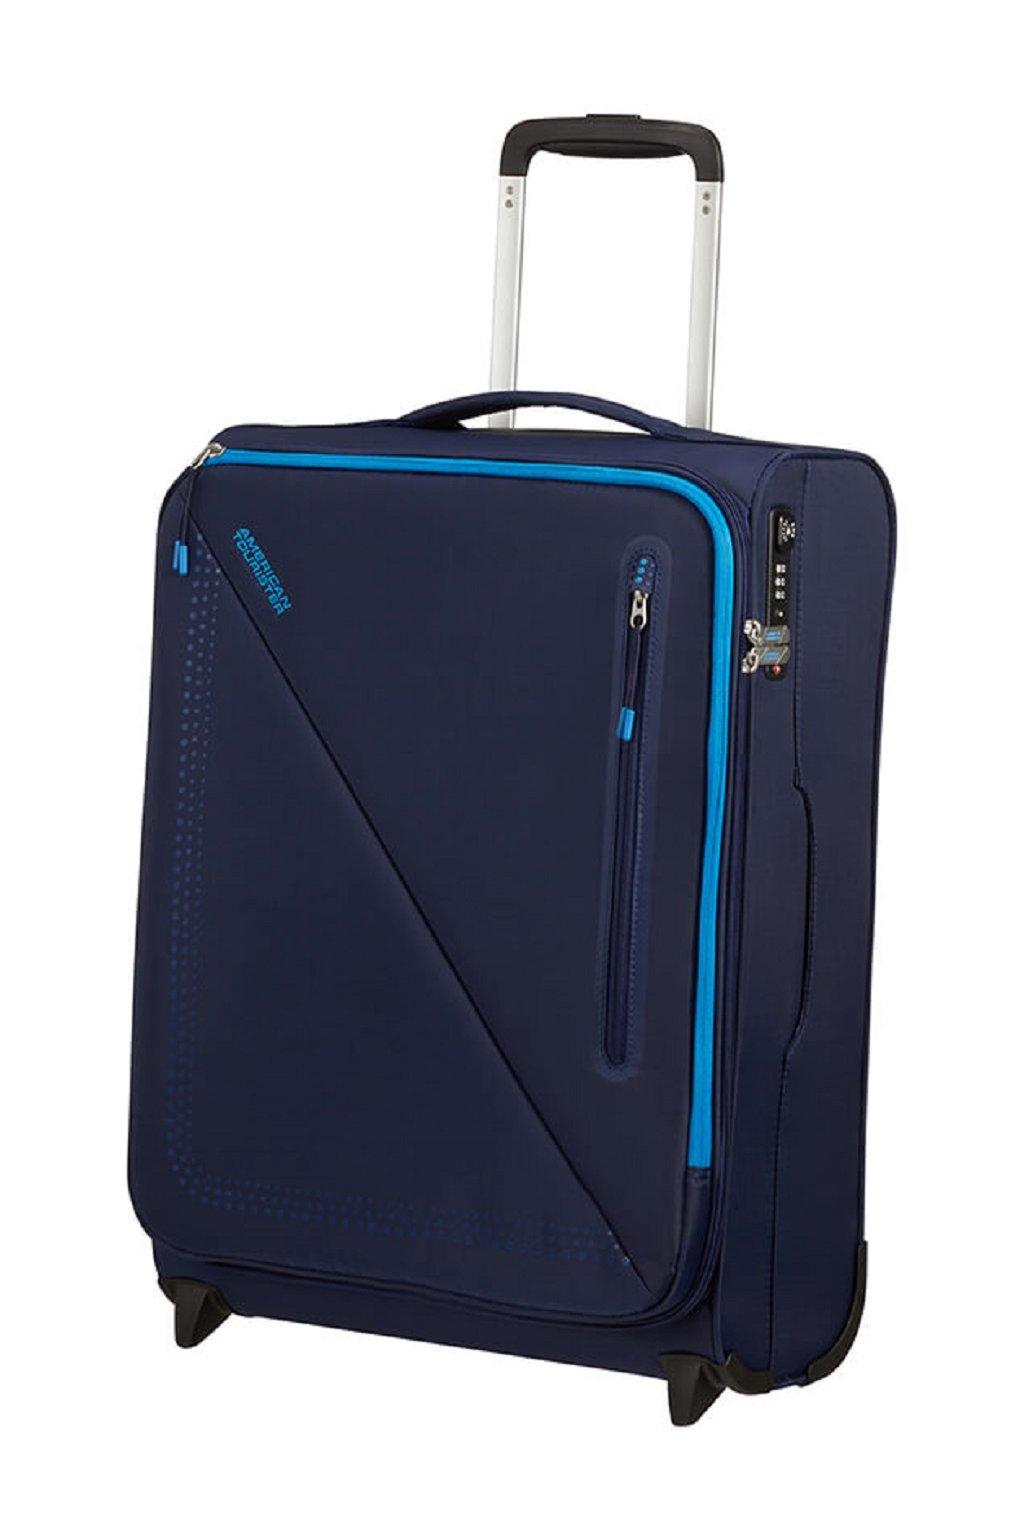 kufrland americantourister litevolt upright blue s 55